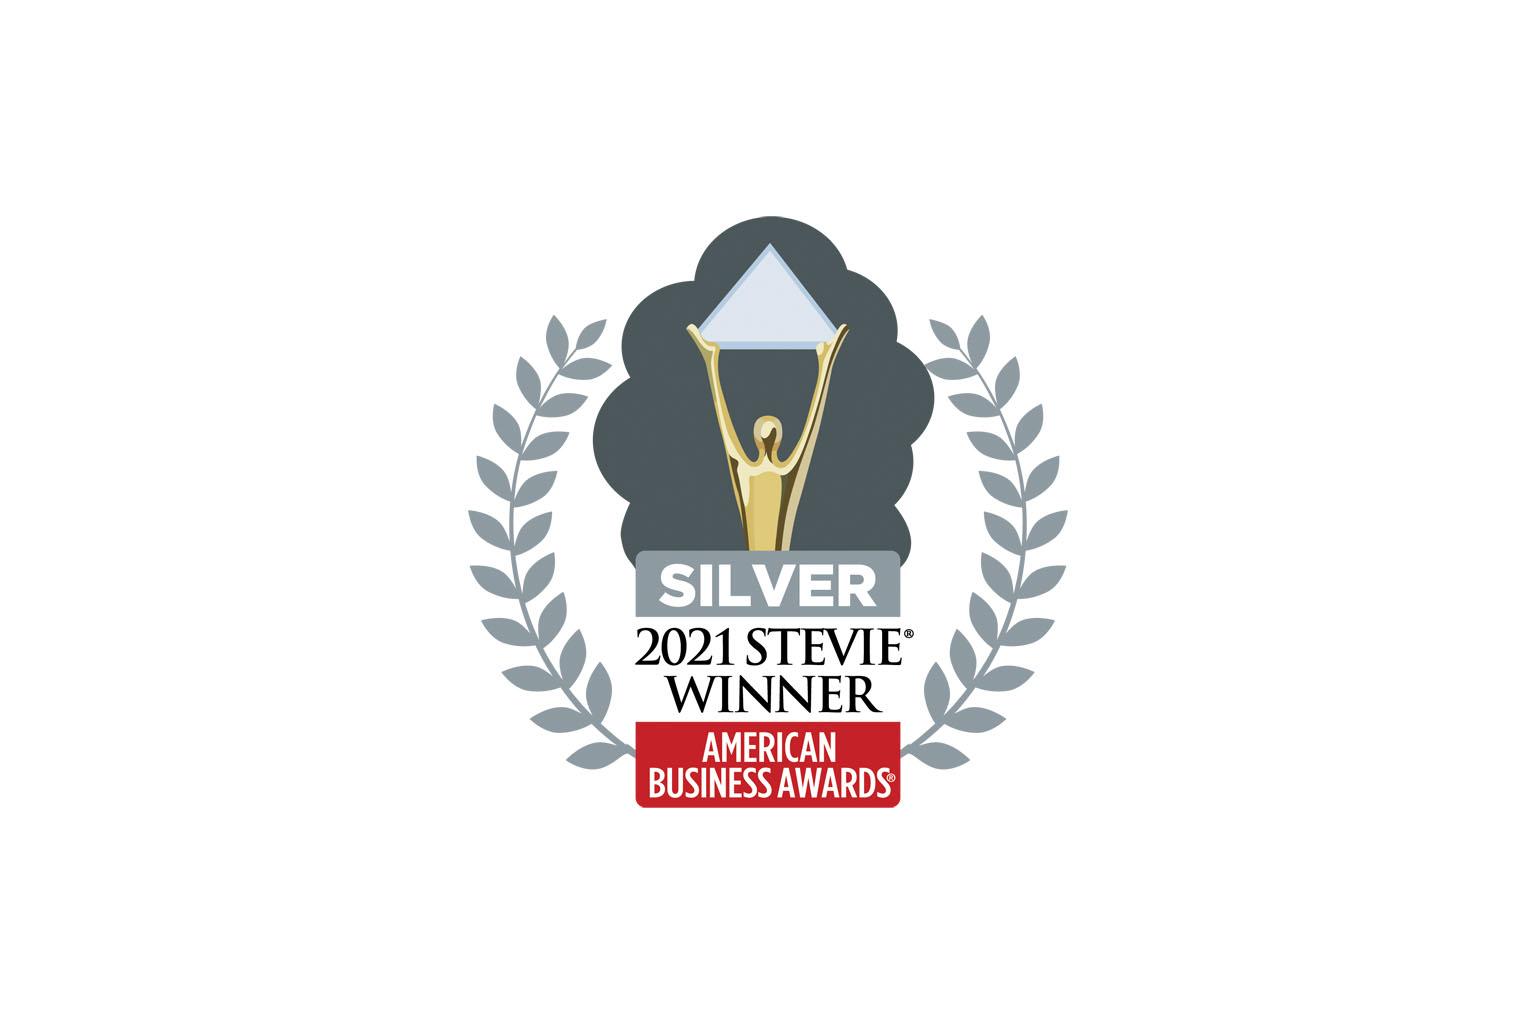 2021 Stevie Silver Award